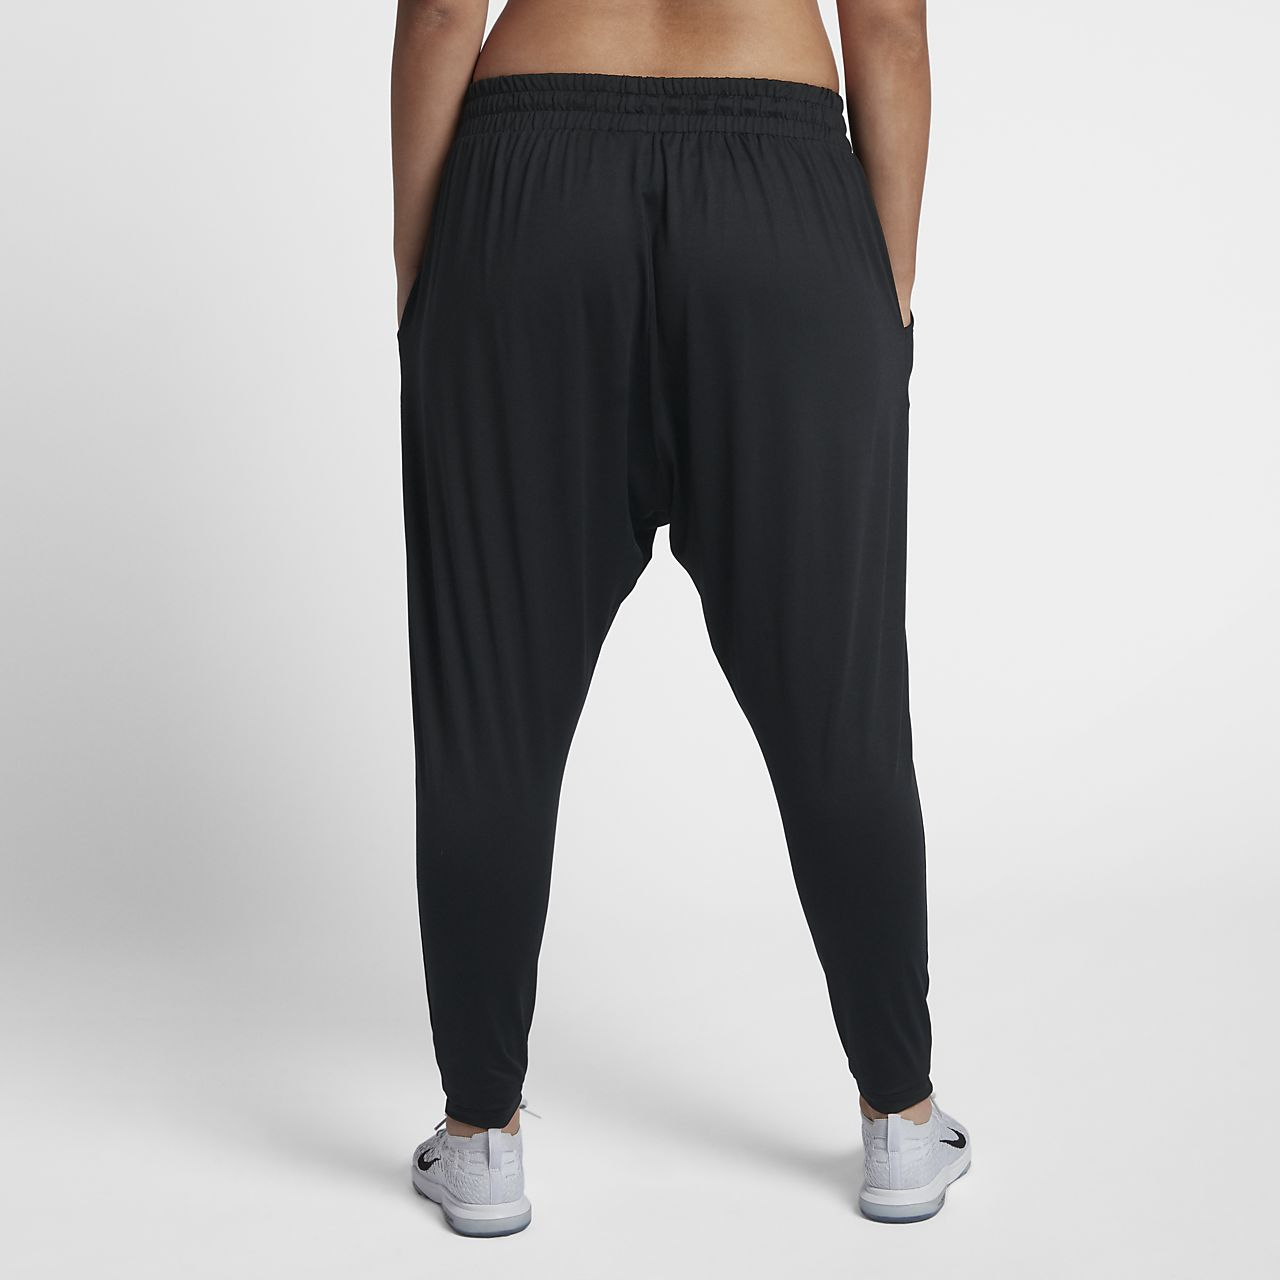 3698548fd3a0 Nike Dri-FIT Flow (Plus Size) Women s Training Trousers. Nike.com CA